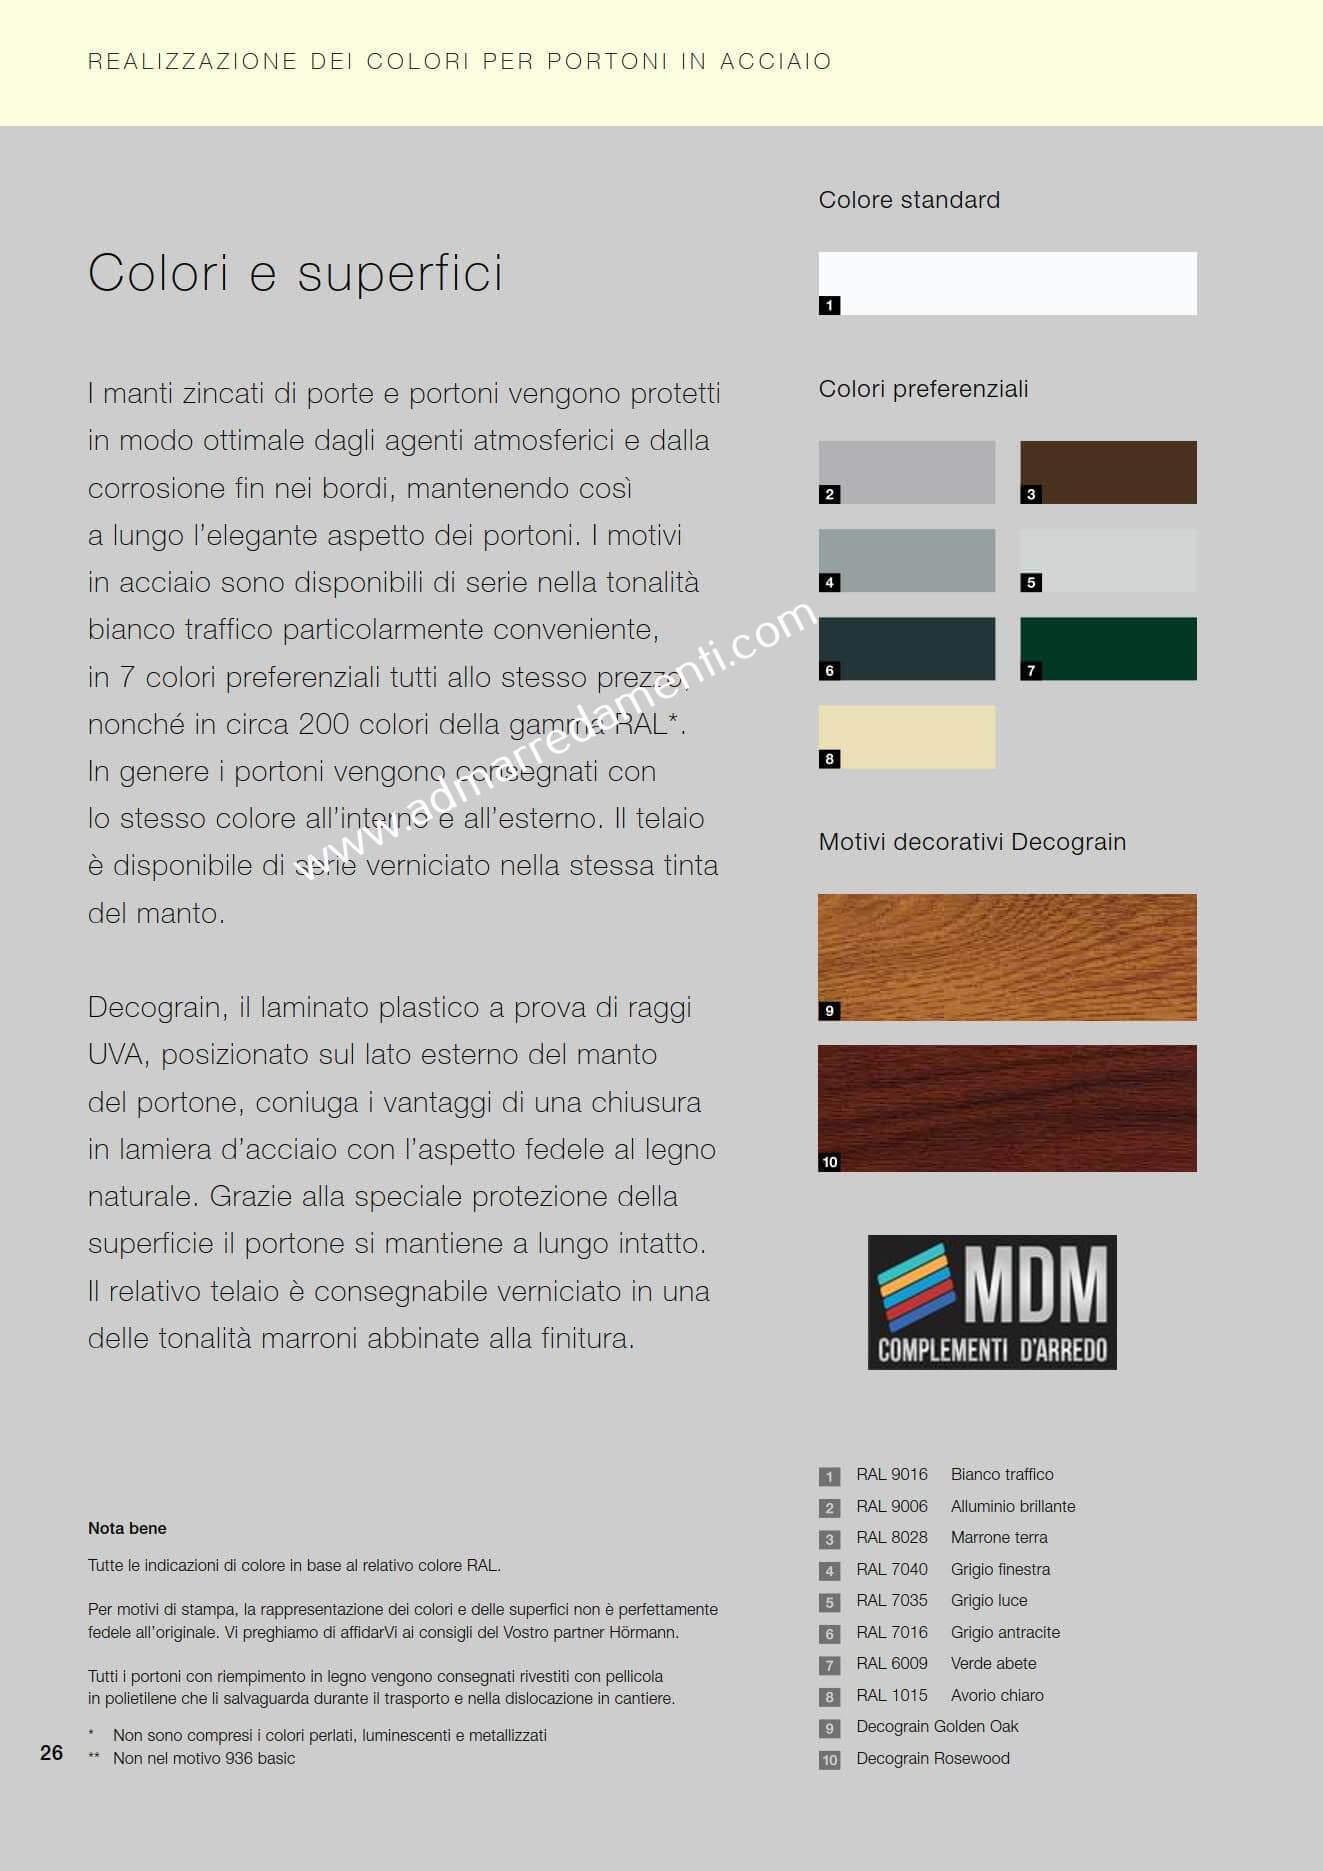 hormann%20colori%20berry-min%20(1).jpg